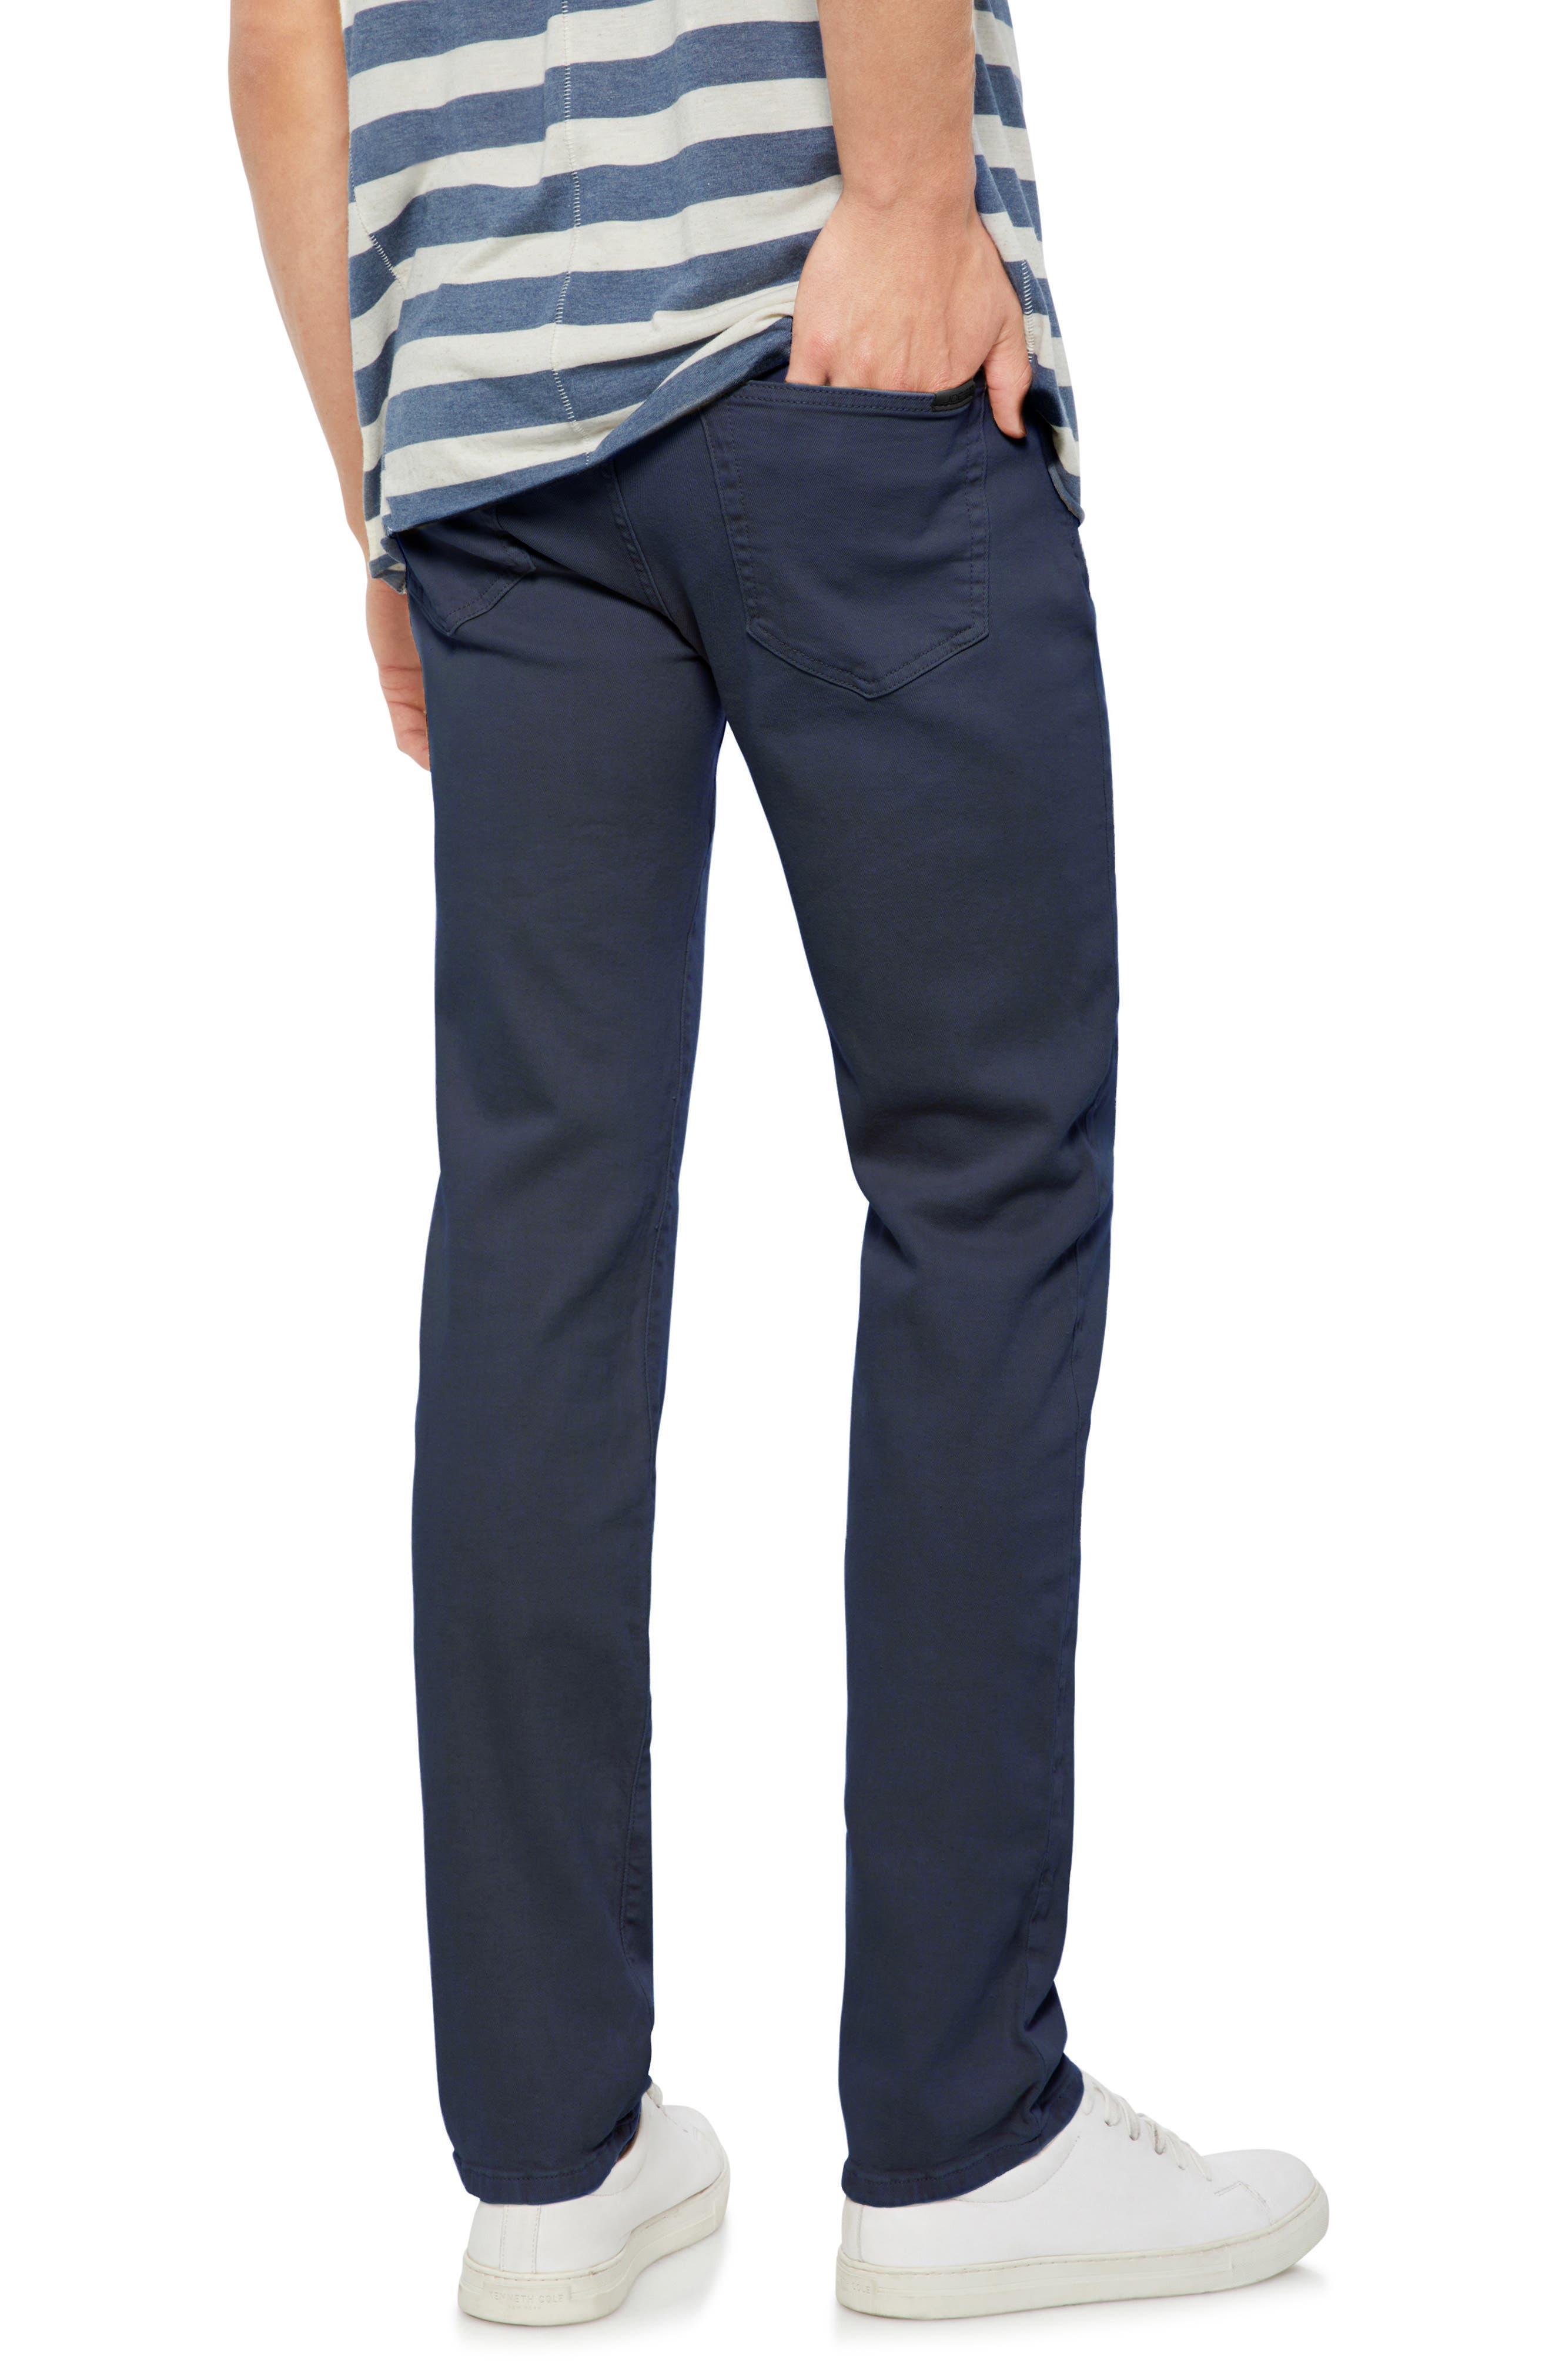 Brixton Slim Straight Leg Jeans,                             Alternate thumbnail 2, color,                             Navy